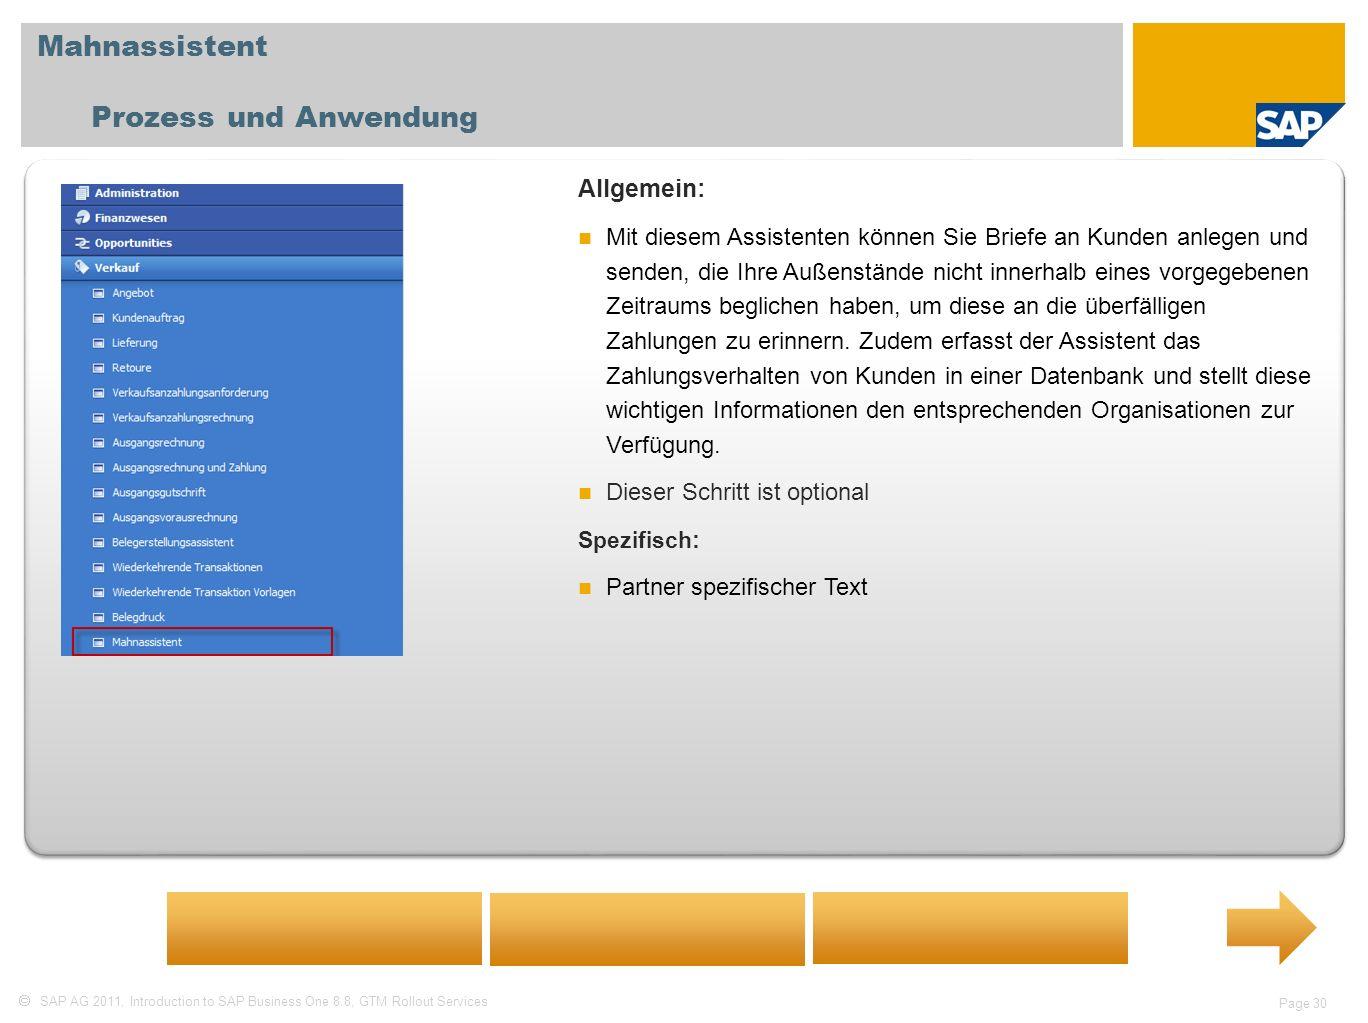 SAP AG 2011, Introduction to SAP Business One 8.8, GTM Rollout Services Page 30 Mahnassistent Prozess und Anwendung Allgemein: Mit diesem Assistenten